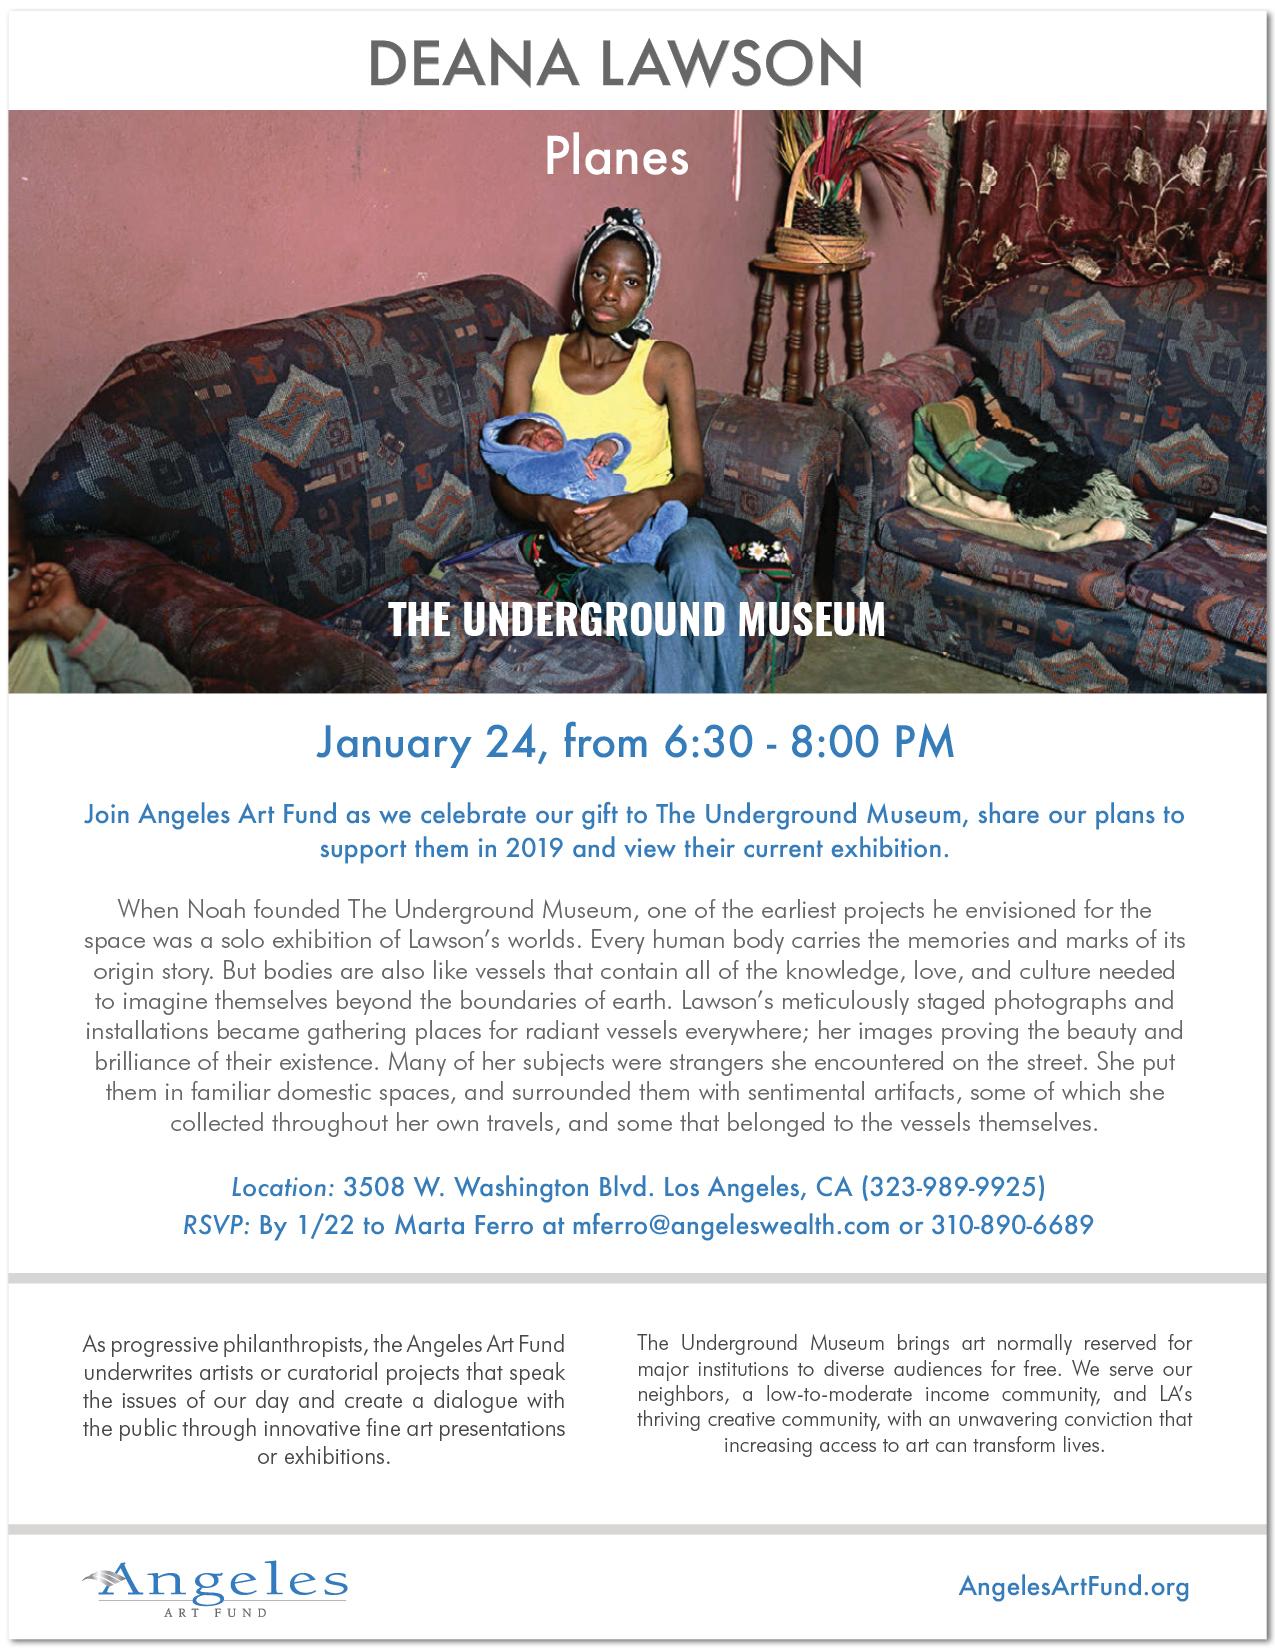 Angeles Art Fund Invites_border4.jpg